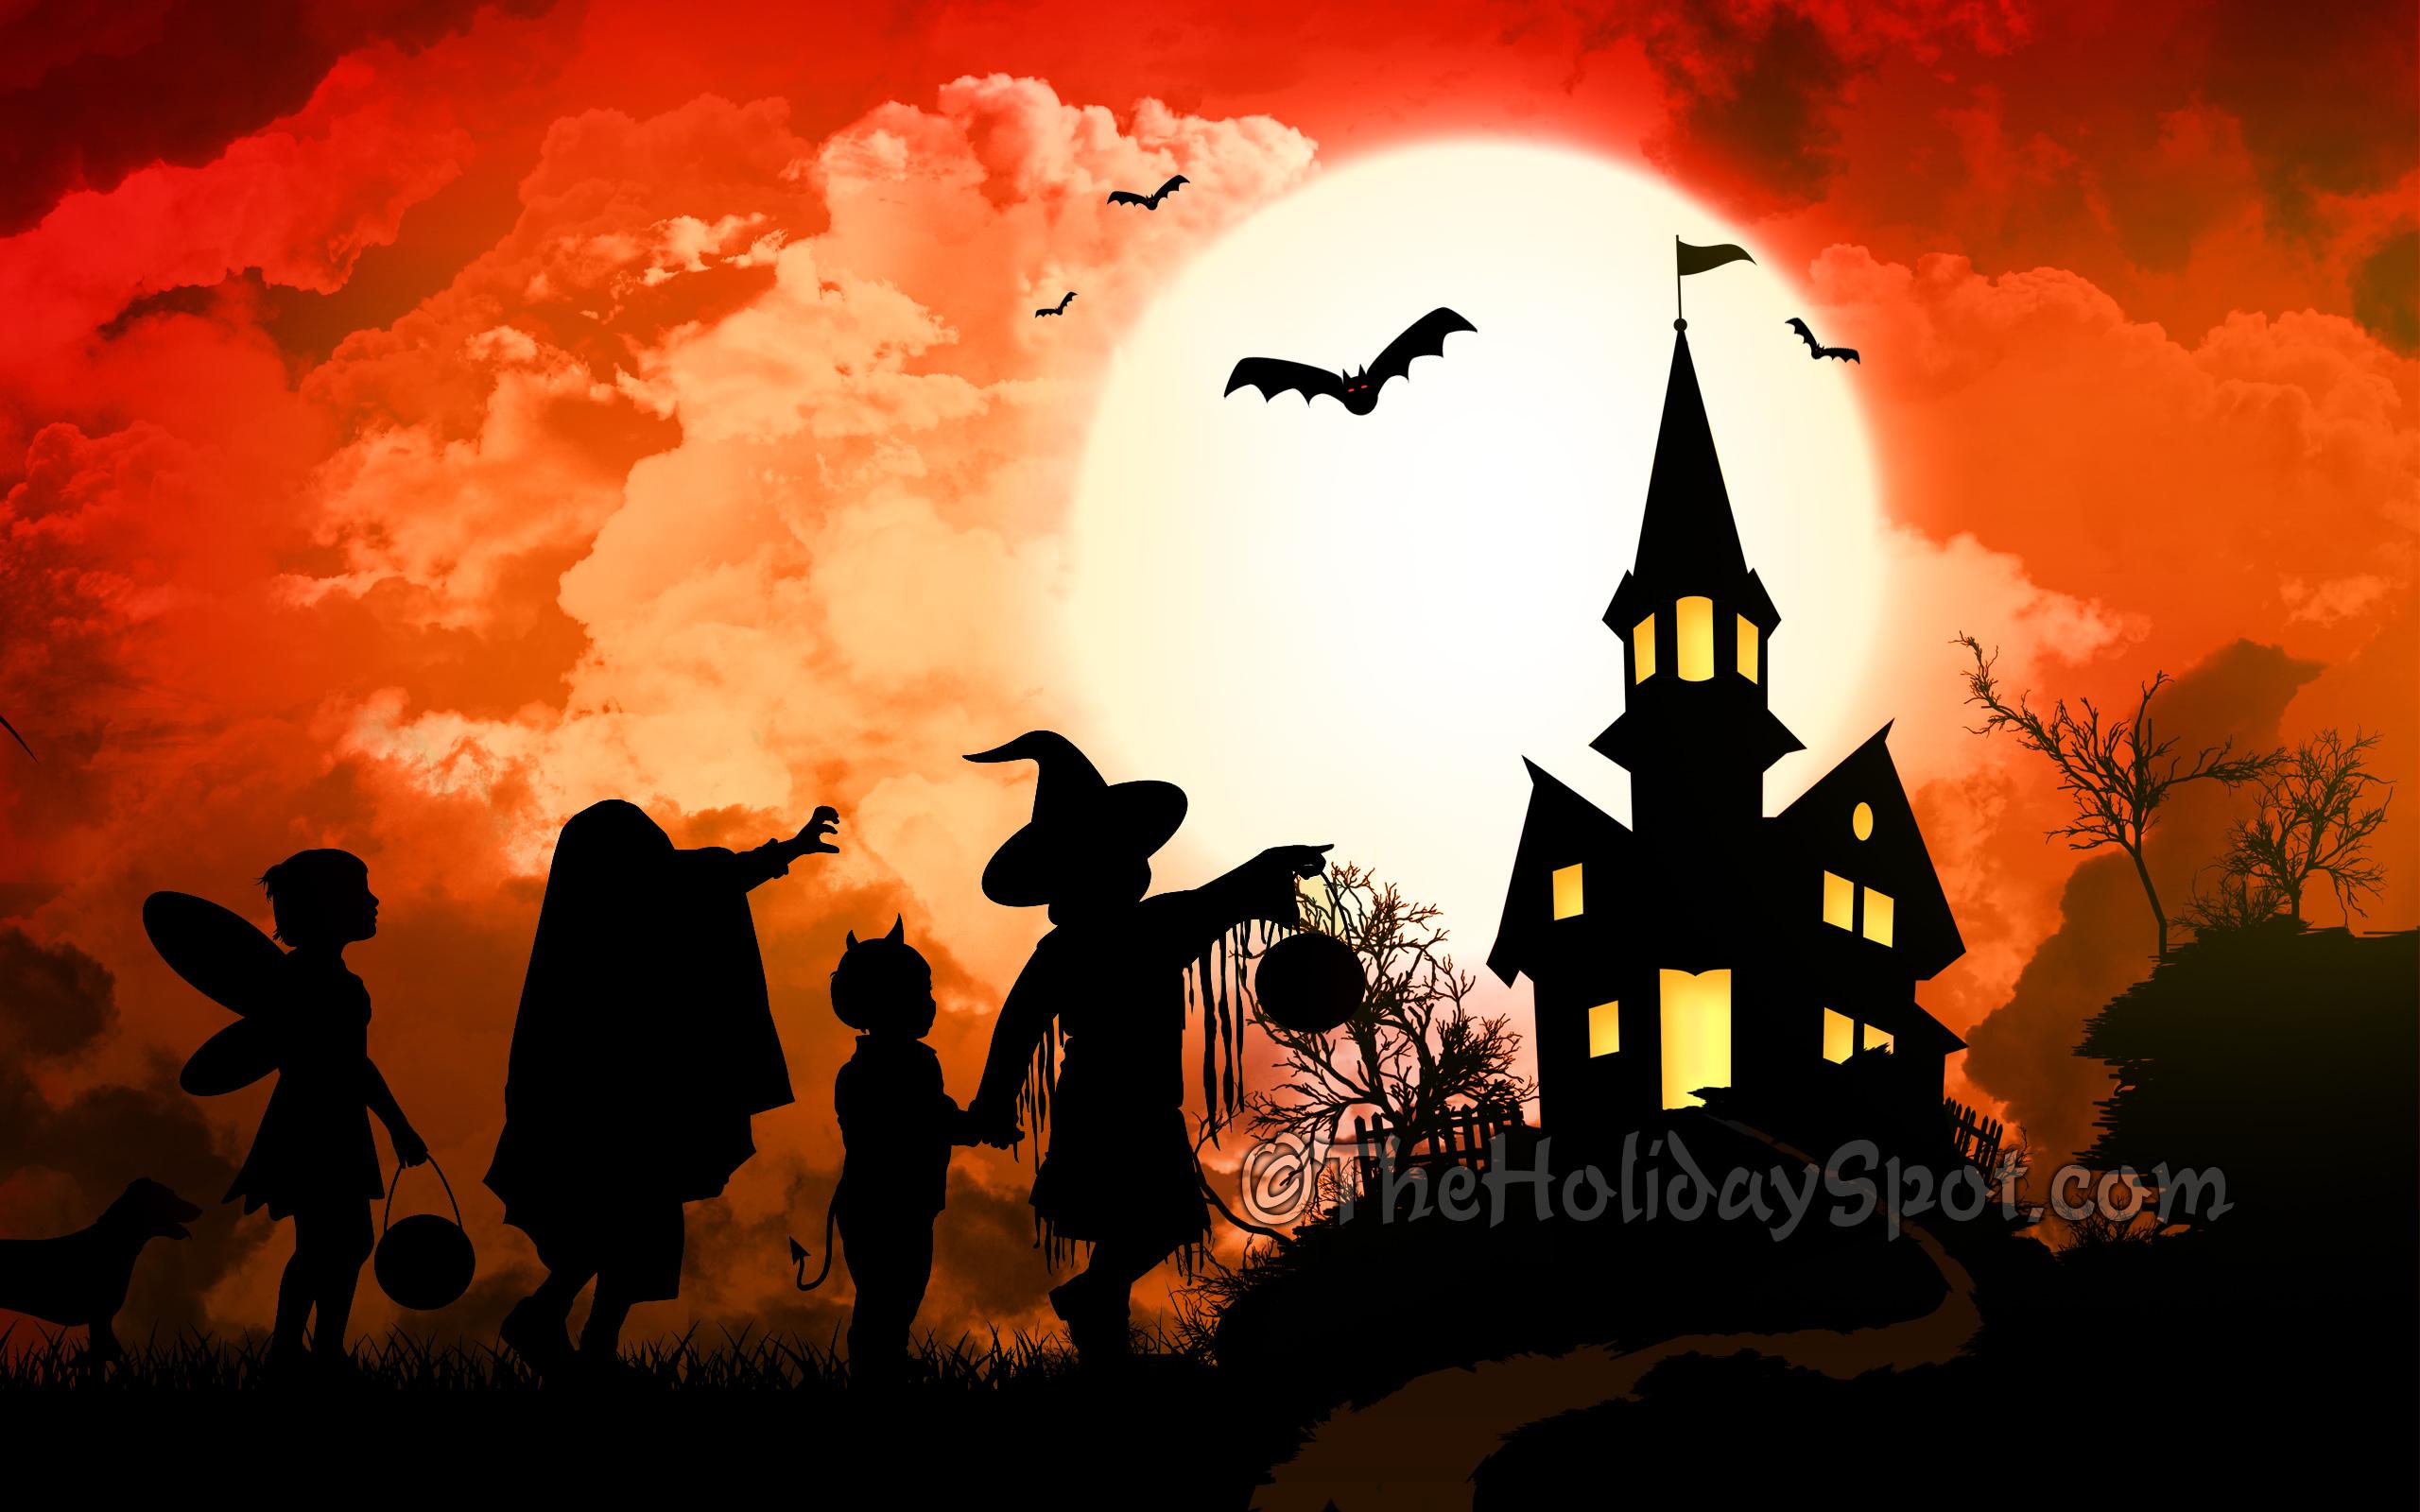 Halloween wallpaper 2560x1600 47195 2560x1600